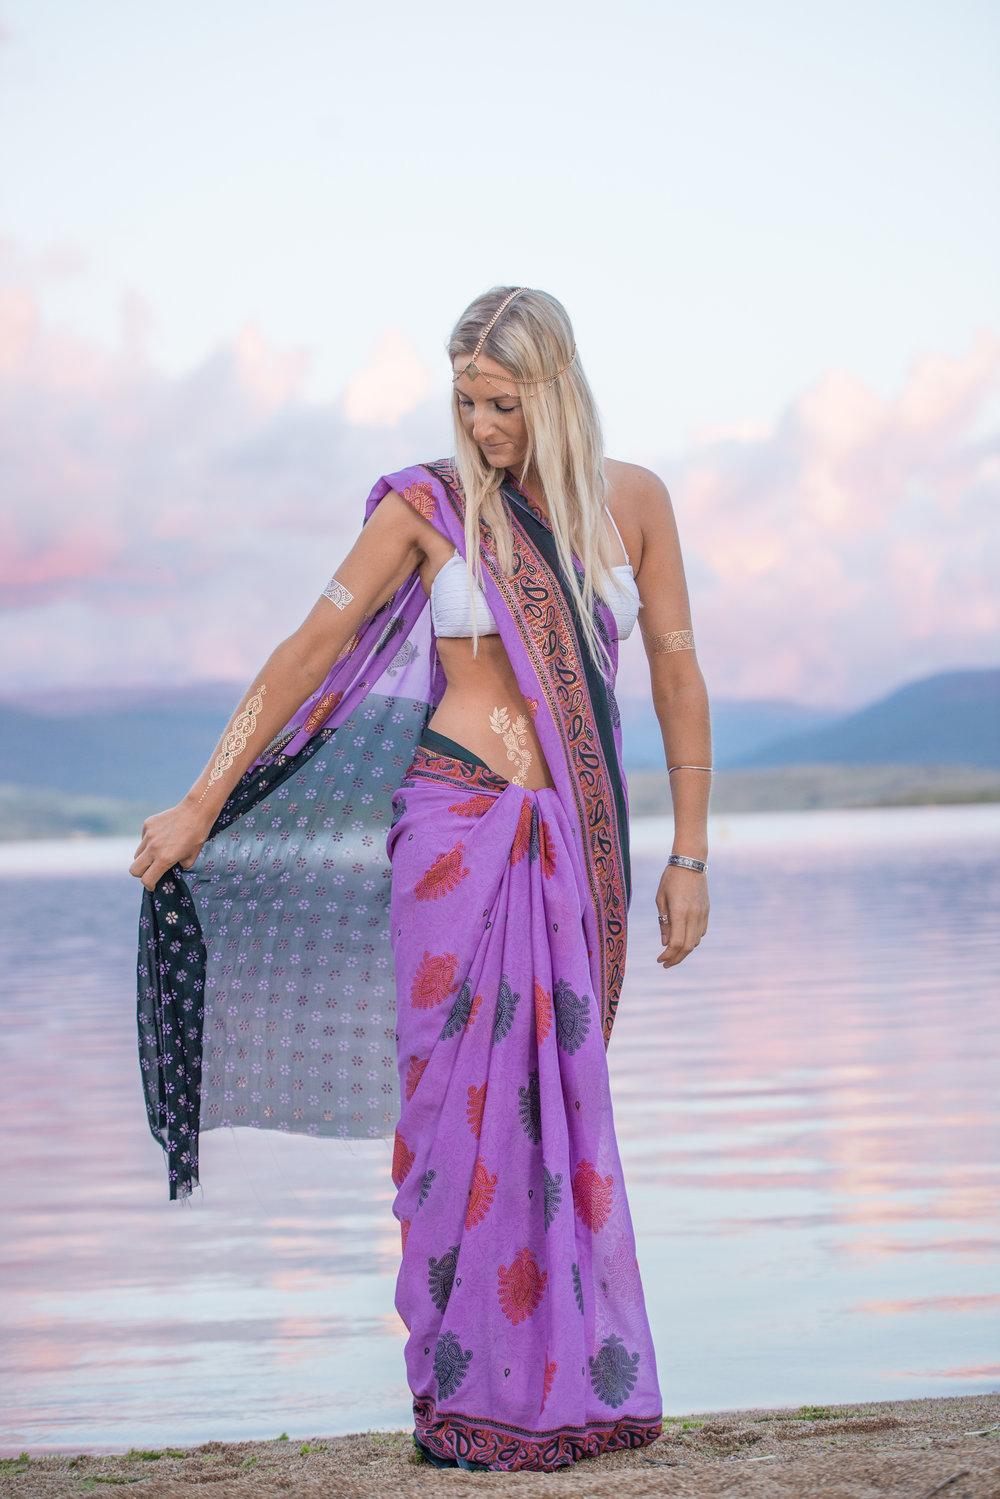 Geogina Eve Yoga